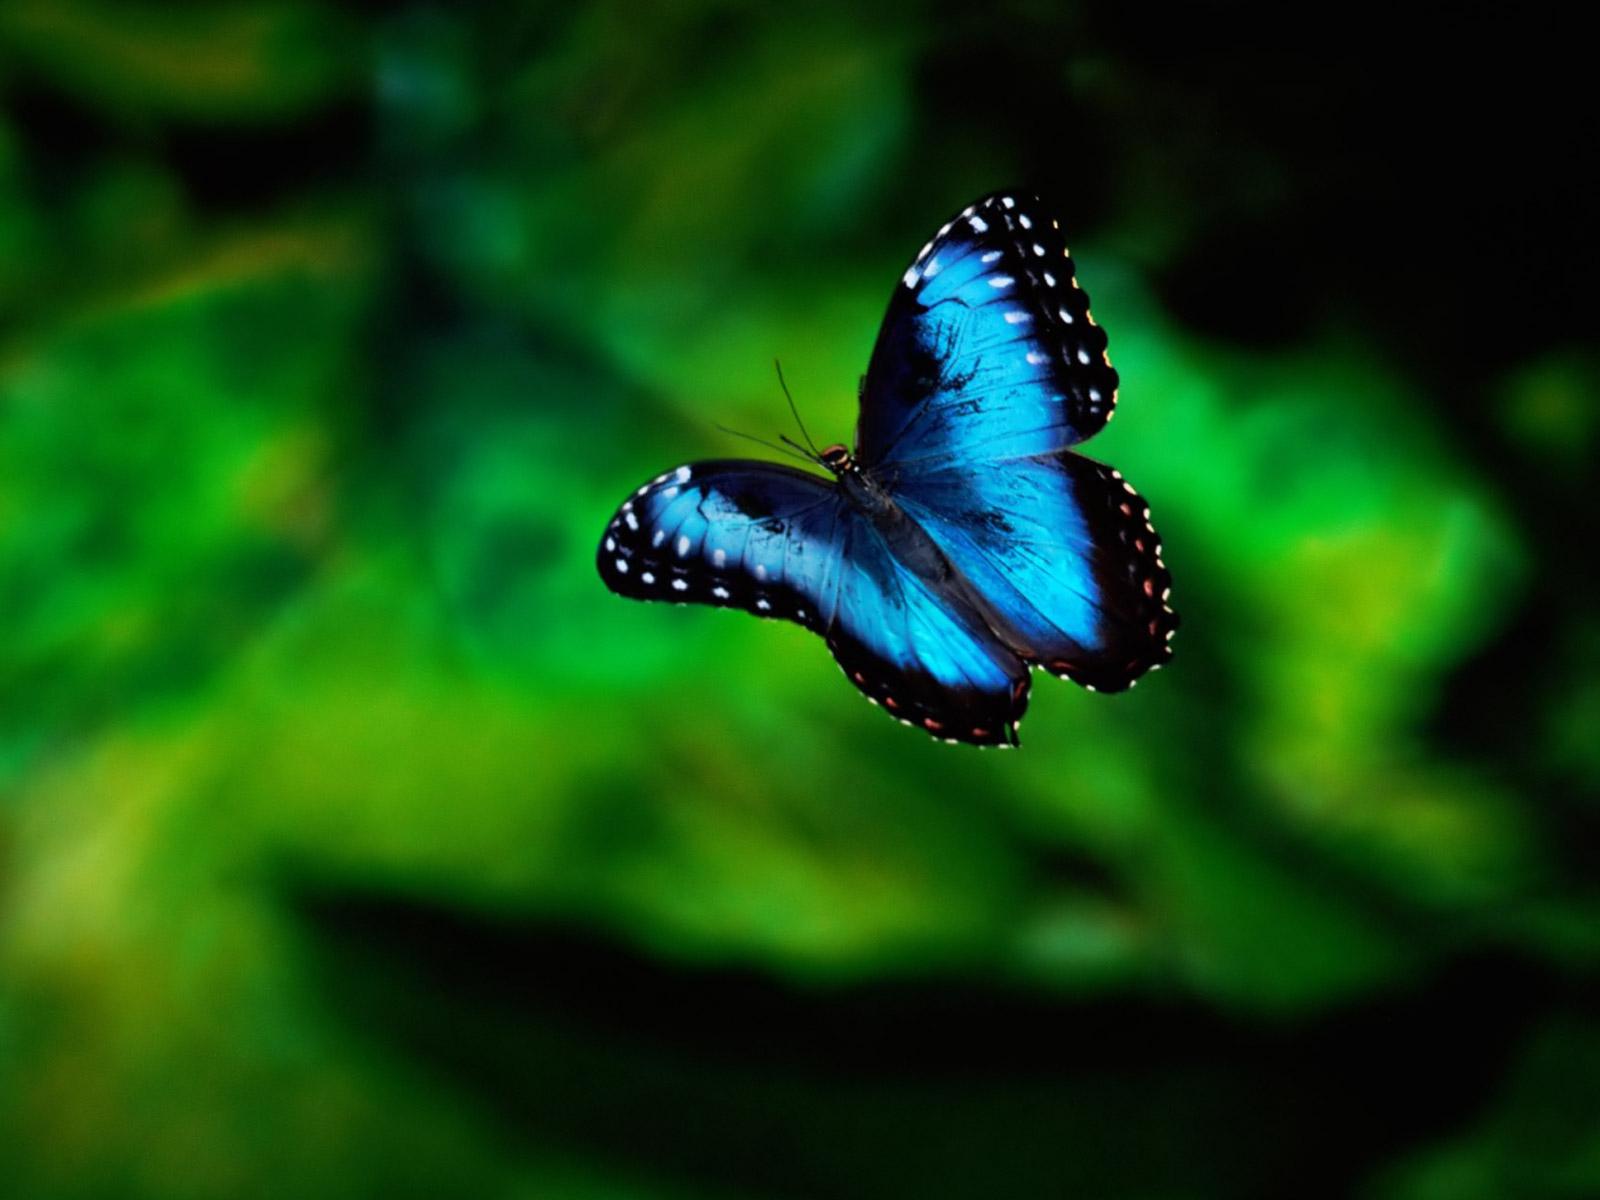 Blue Butterfly HD Wallpaper Animals Wallpapers 1600x1200